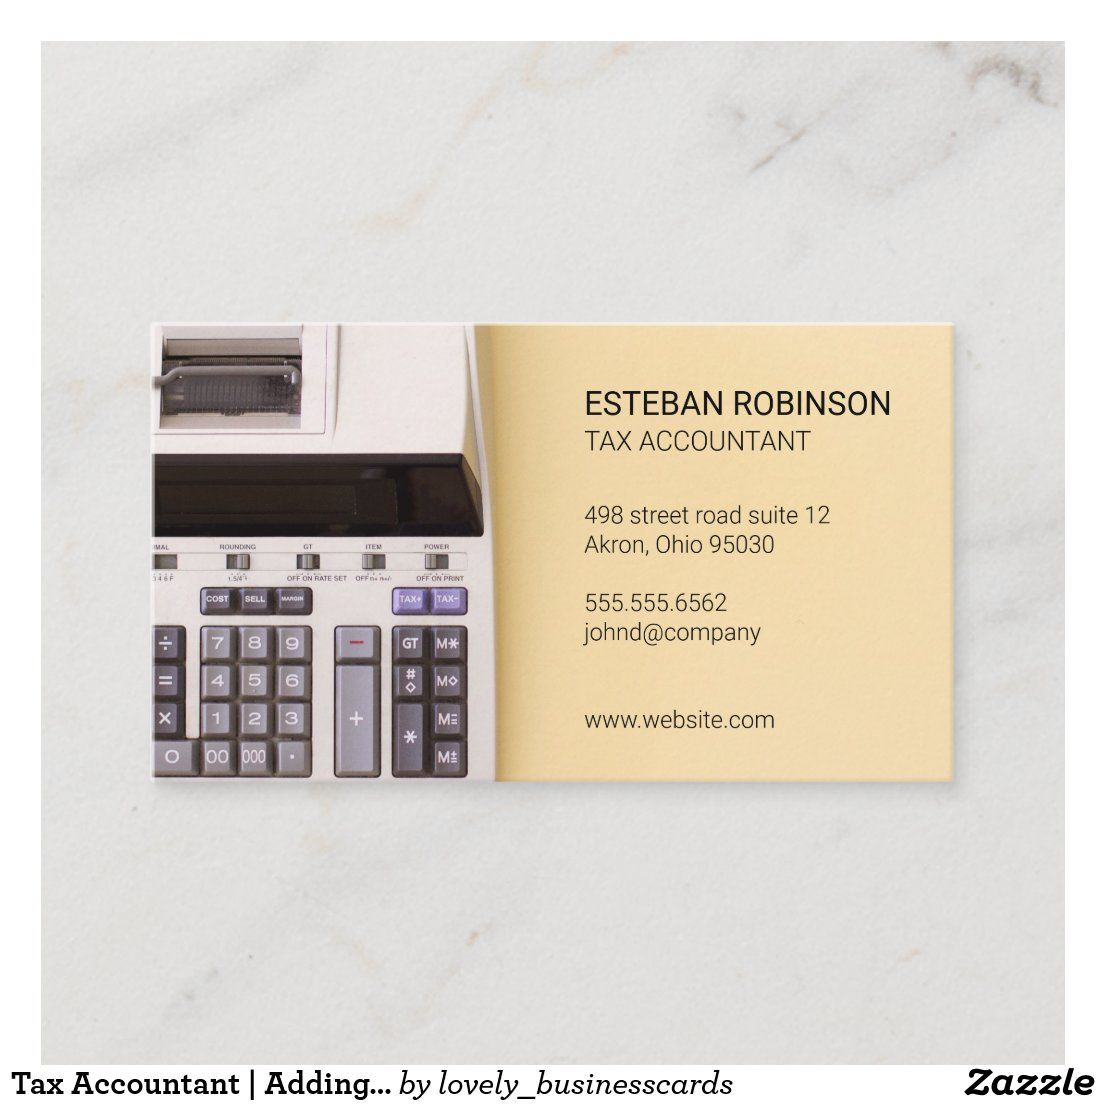 Tax Accountant Adding Machine Business Card Zazzle Com Tax Accountant Bookkeeping Business Accounting